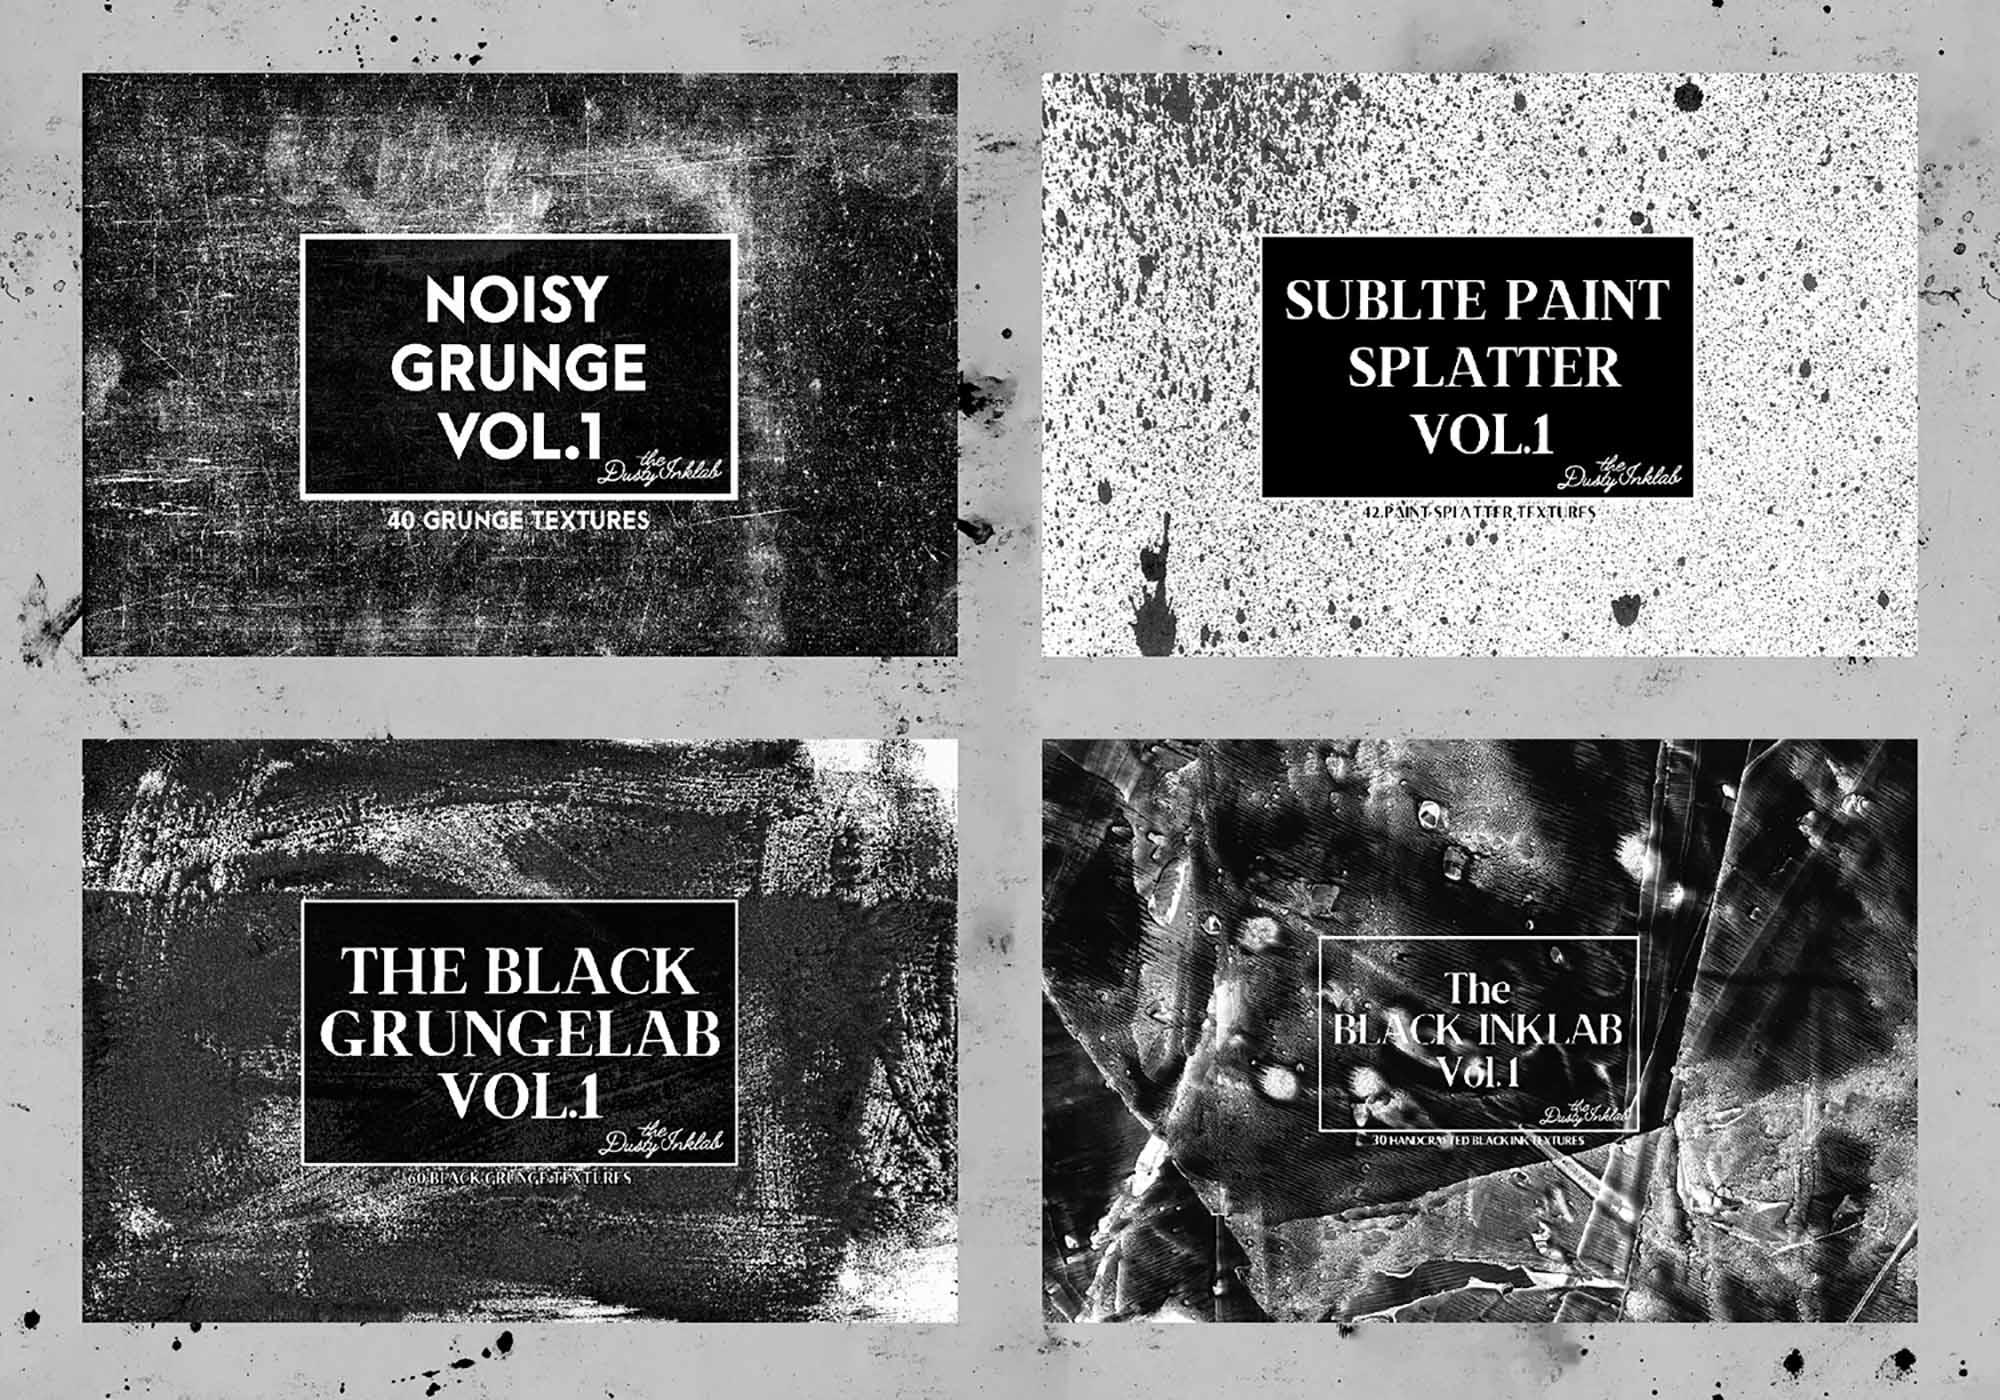 Dusty Inklab Grunge Textures 2